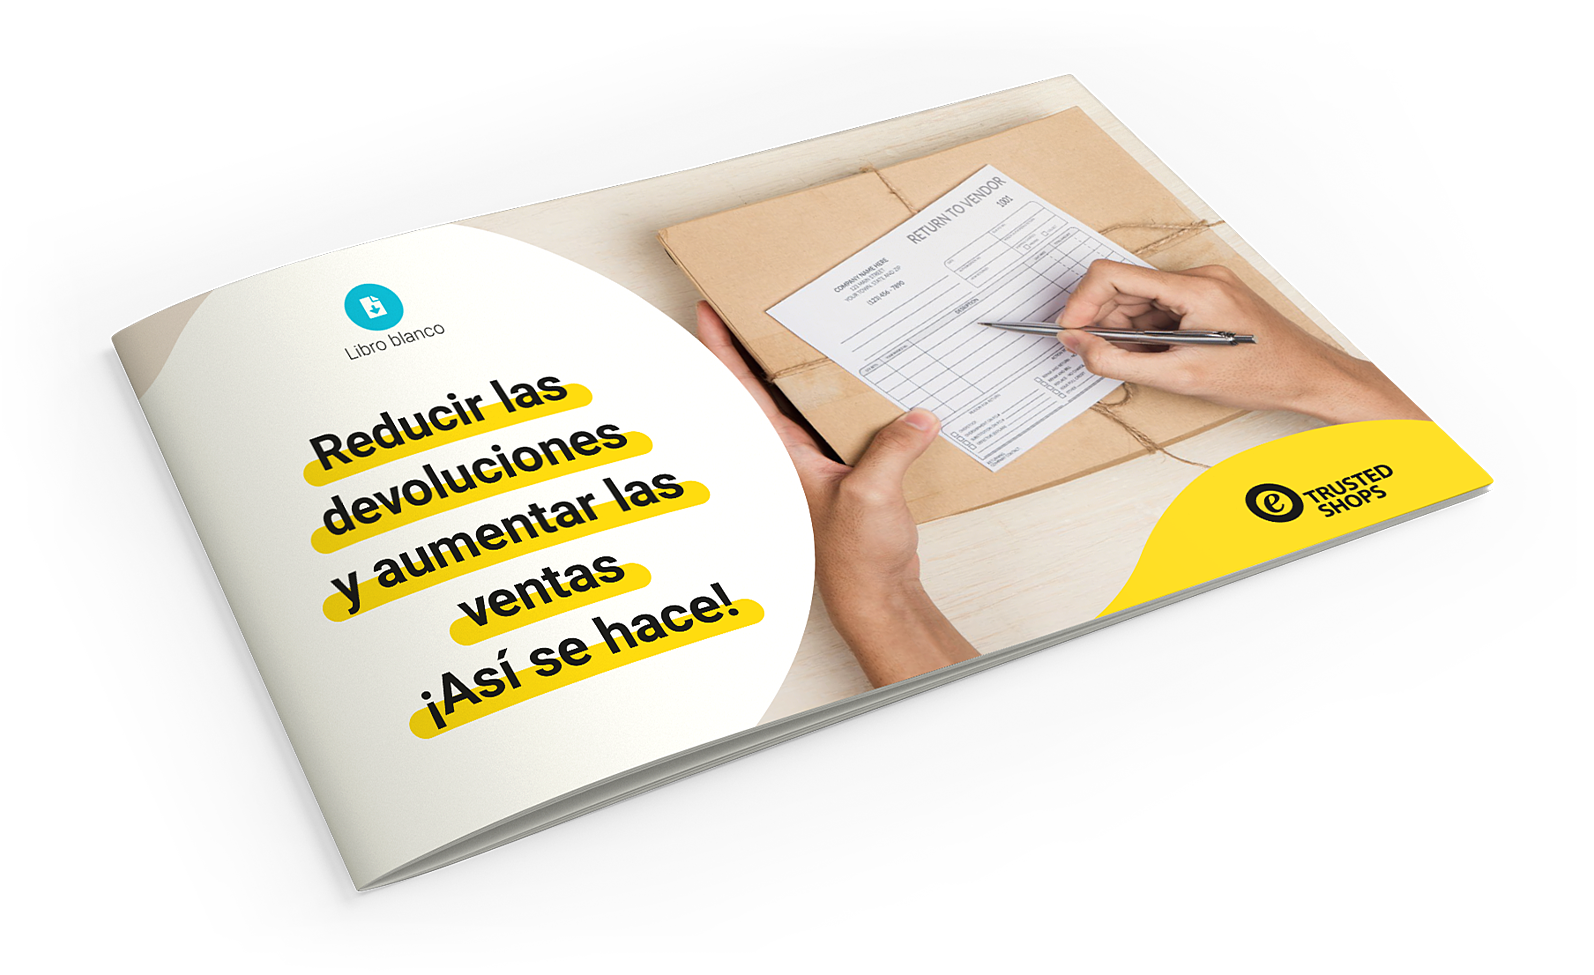 whitepaperTeaser-reducir_devoluciones-fullResolution